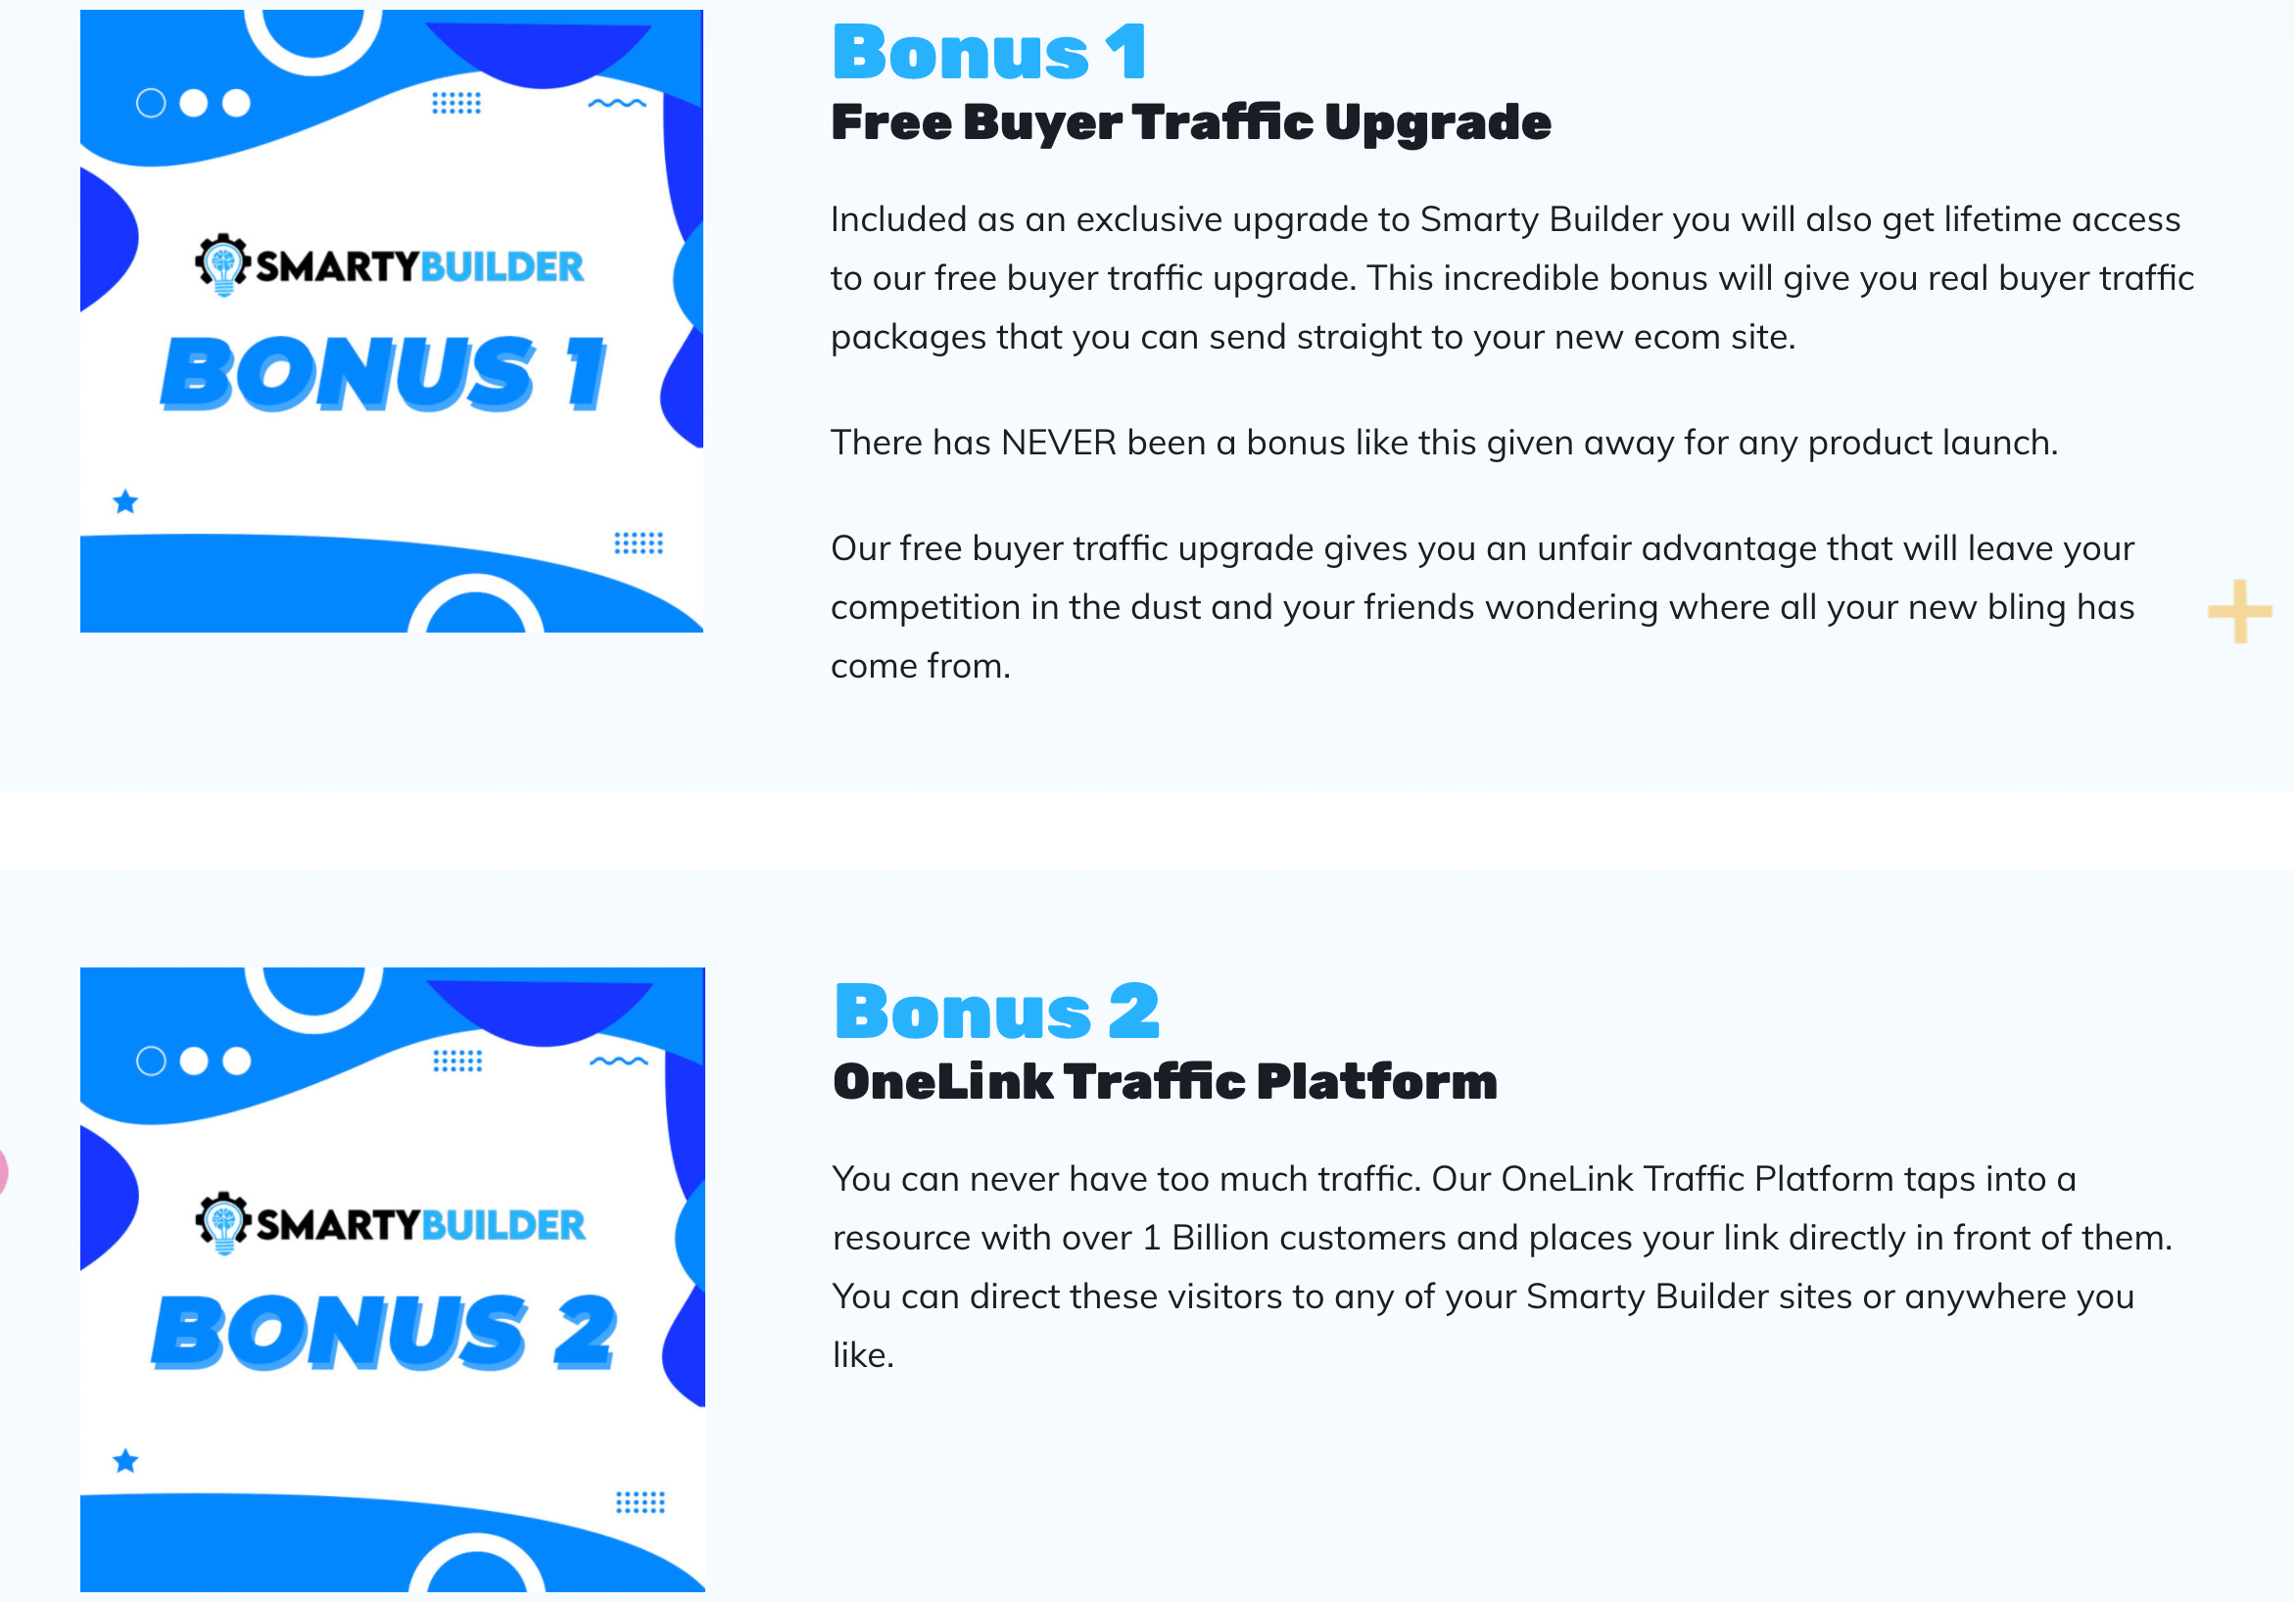 smarty builder bonuses